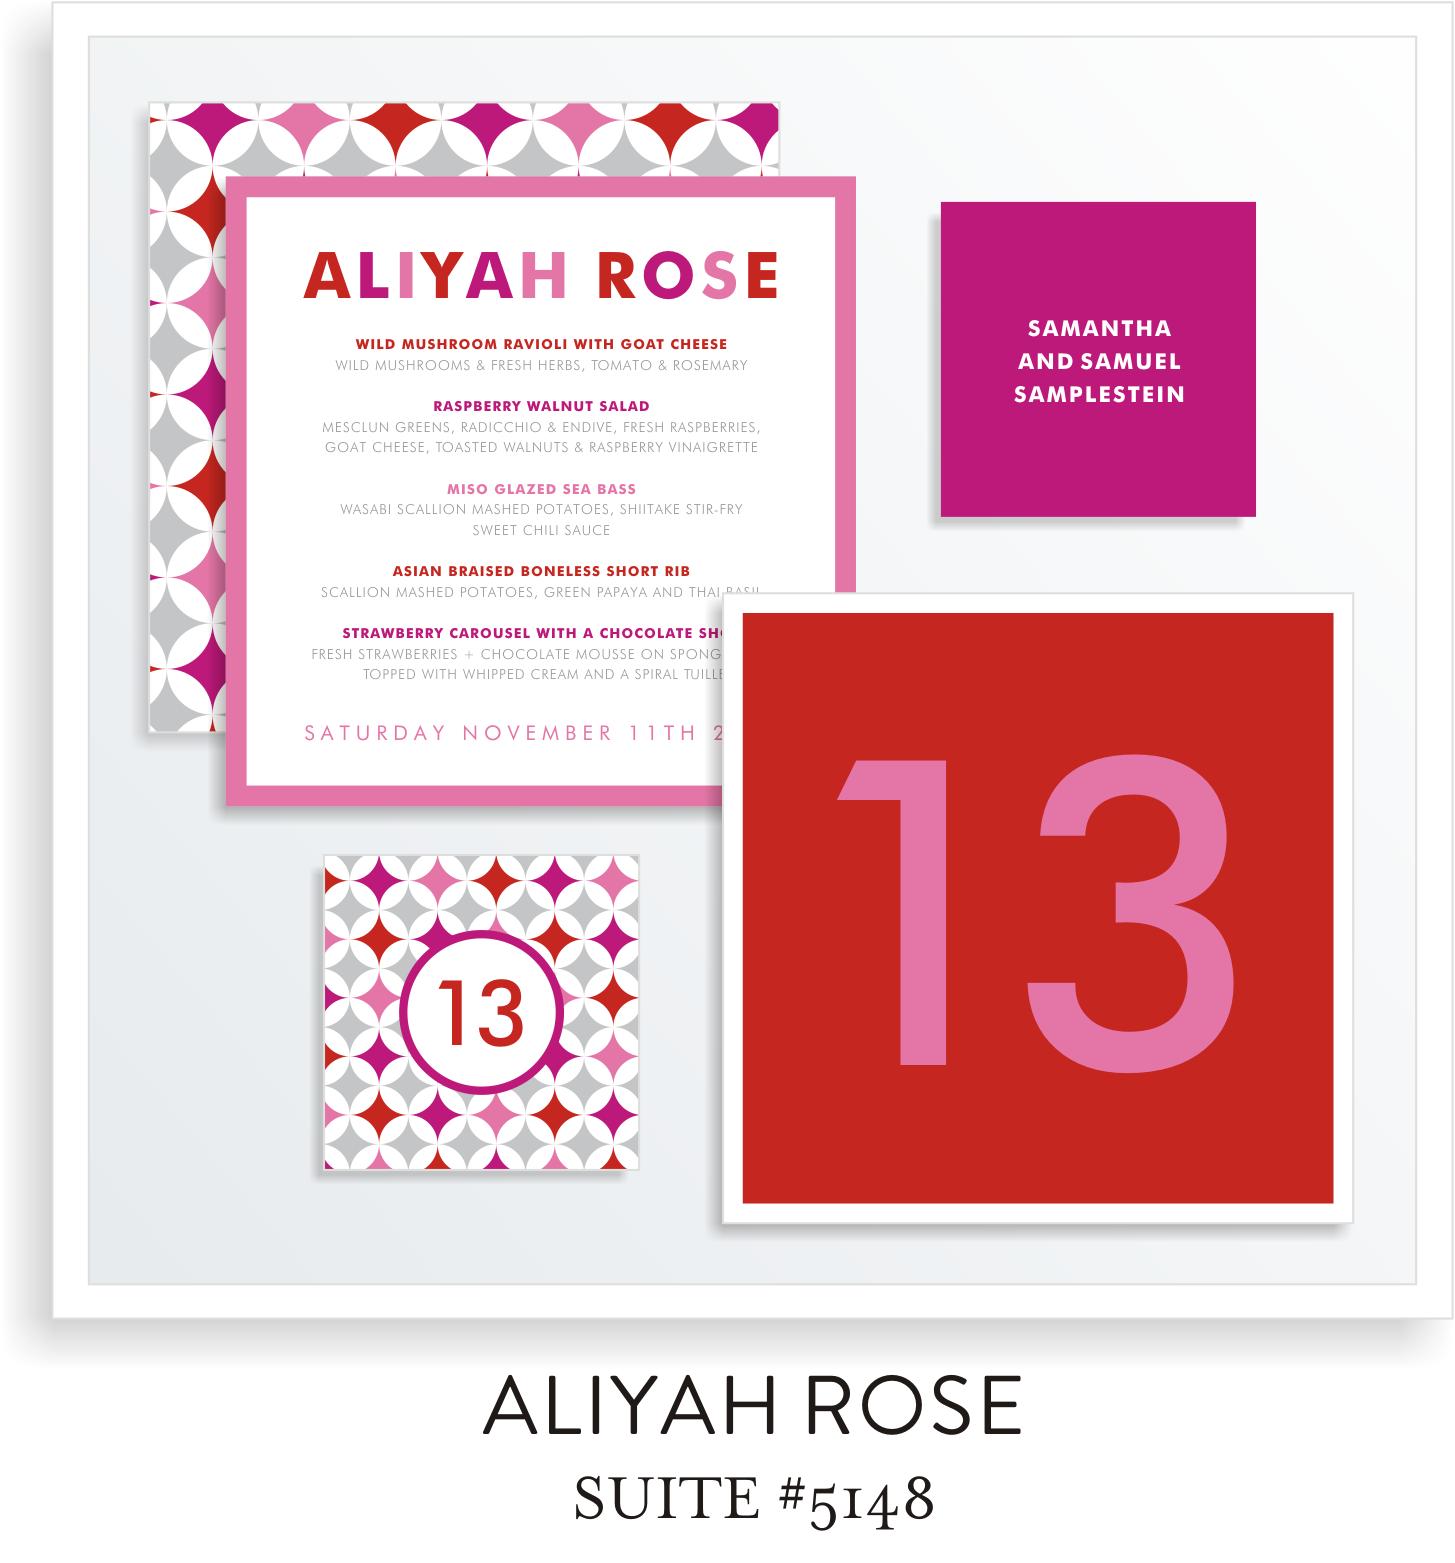 Table Top Decor Bat Mitzvah Suite 5148 - Aliyah Rose